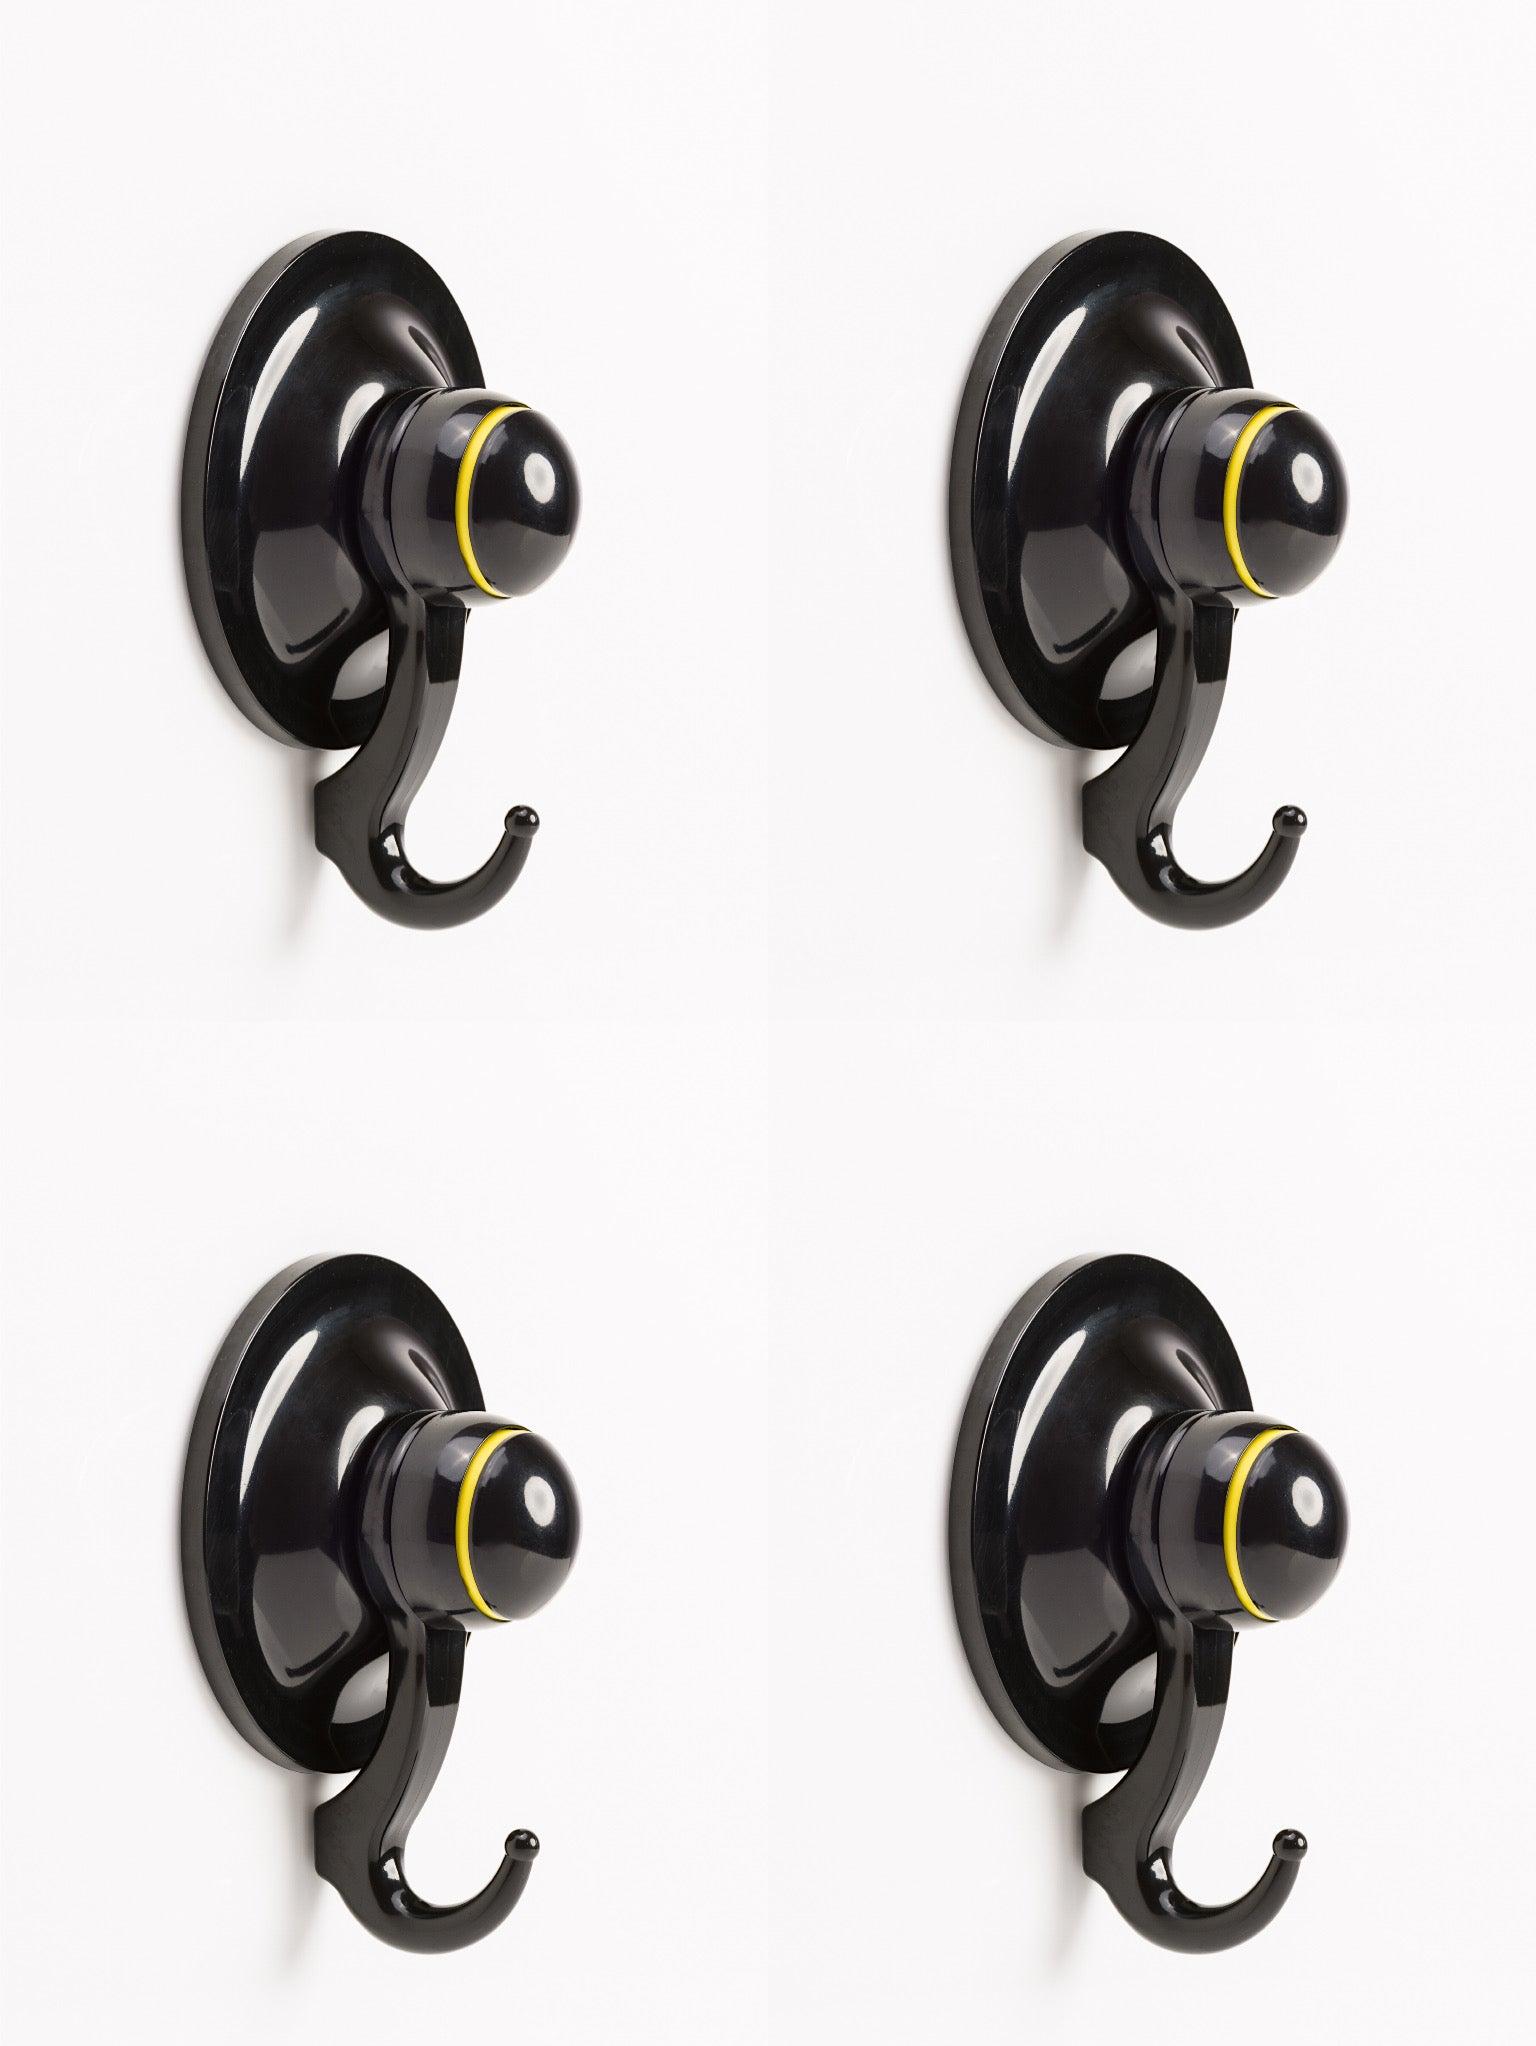 KiahLoc 4pcs Gift Pack Suction Hook Large(72mm) - Black